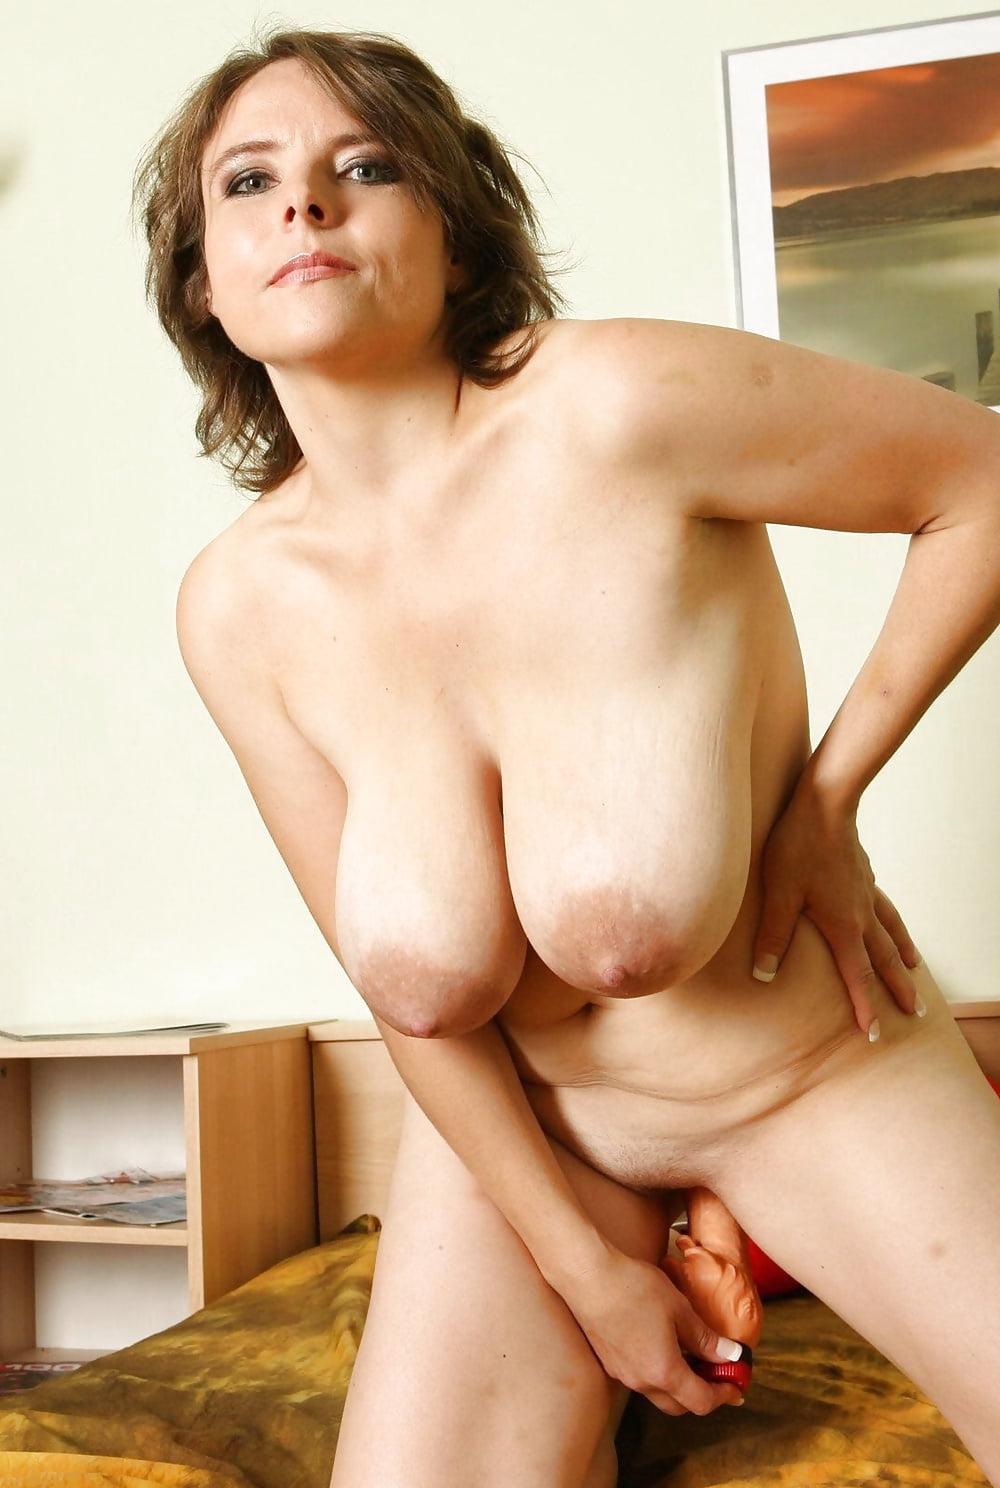 big-floppy-tits-free-pics-eyed-brunette-nude